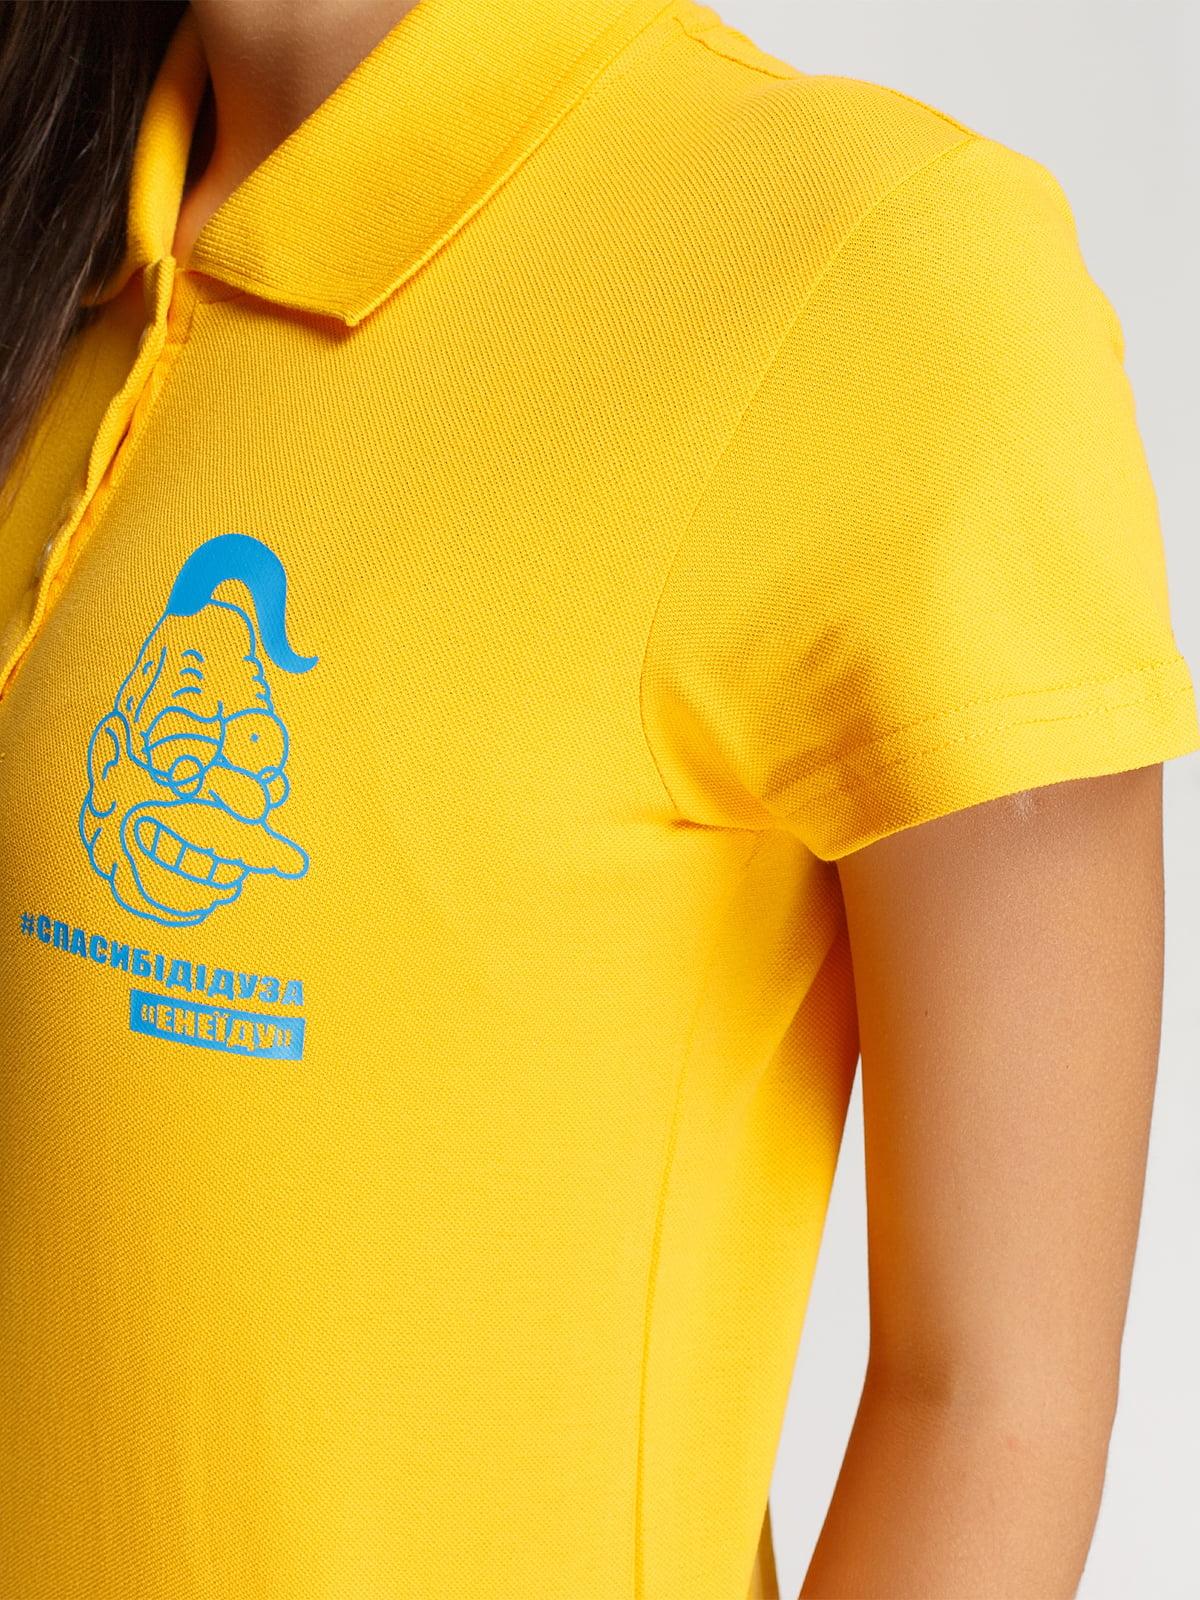 Футболка-поло жовта з принтом | 4578479 | фото 3